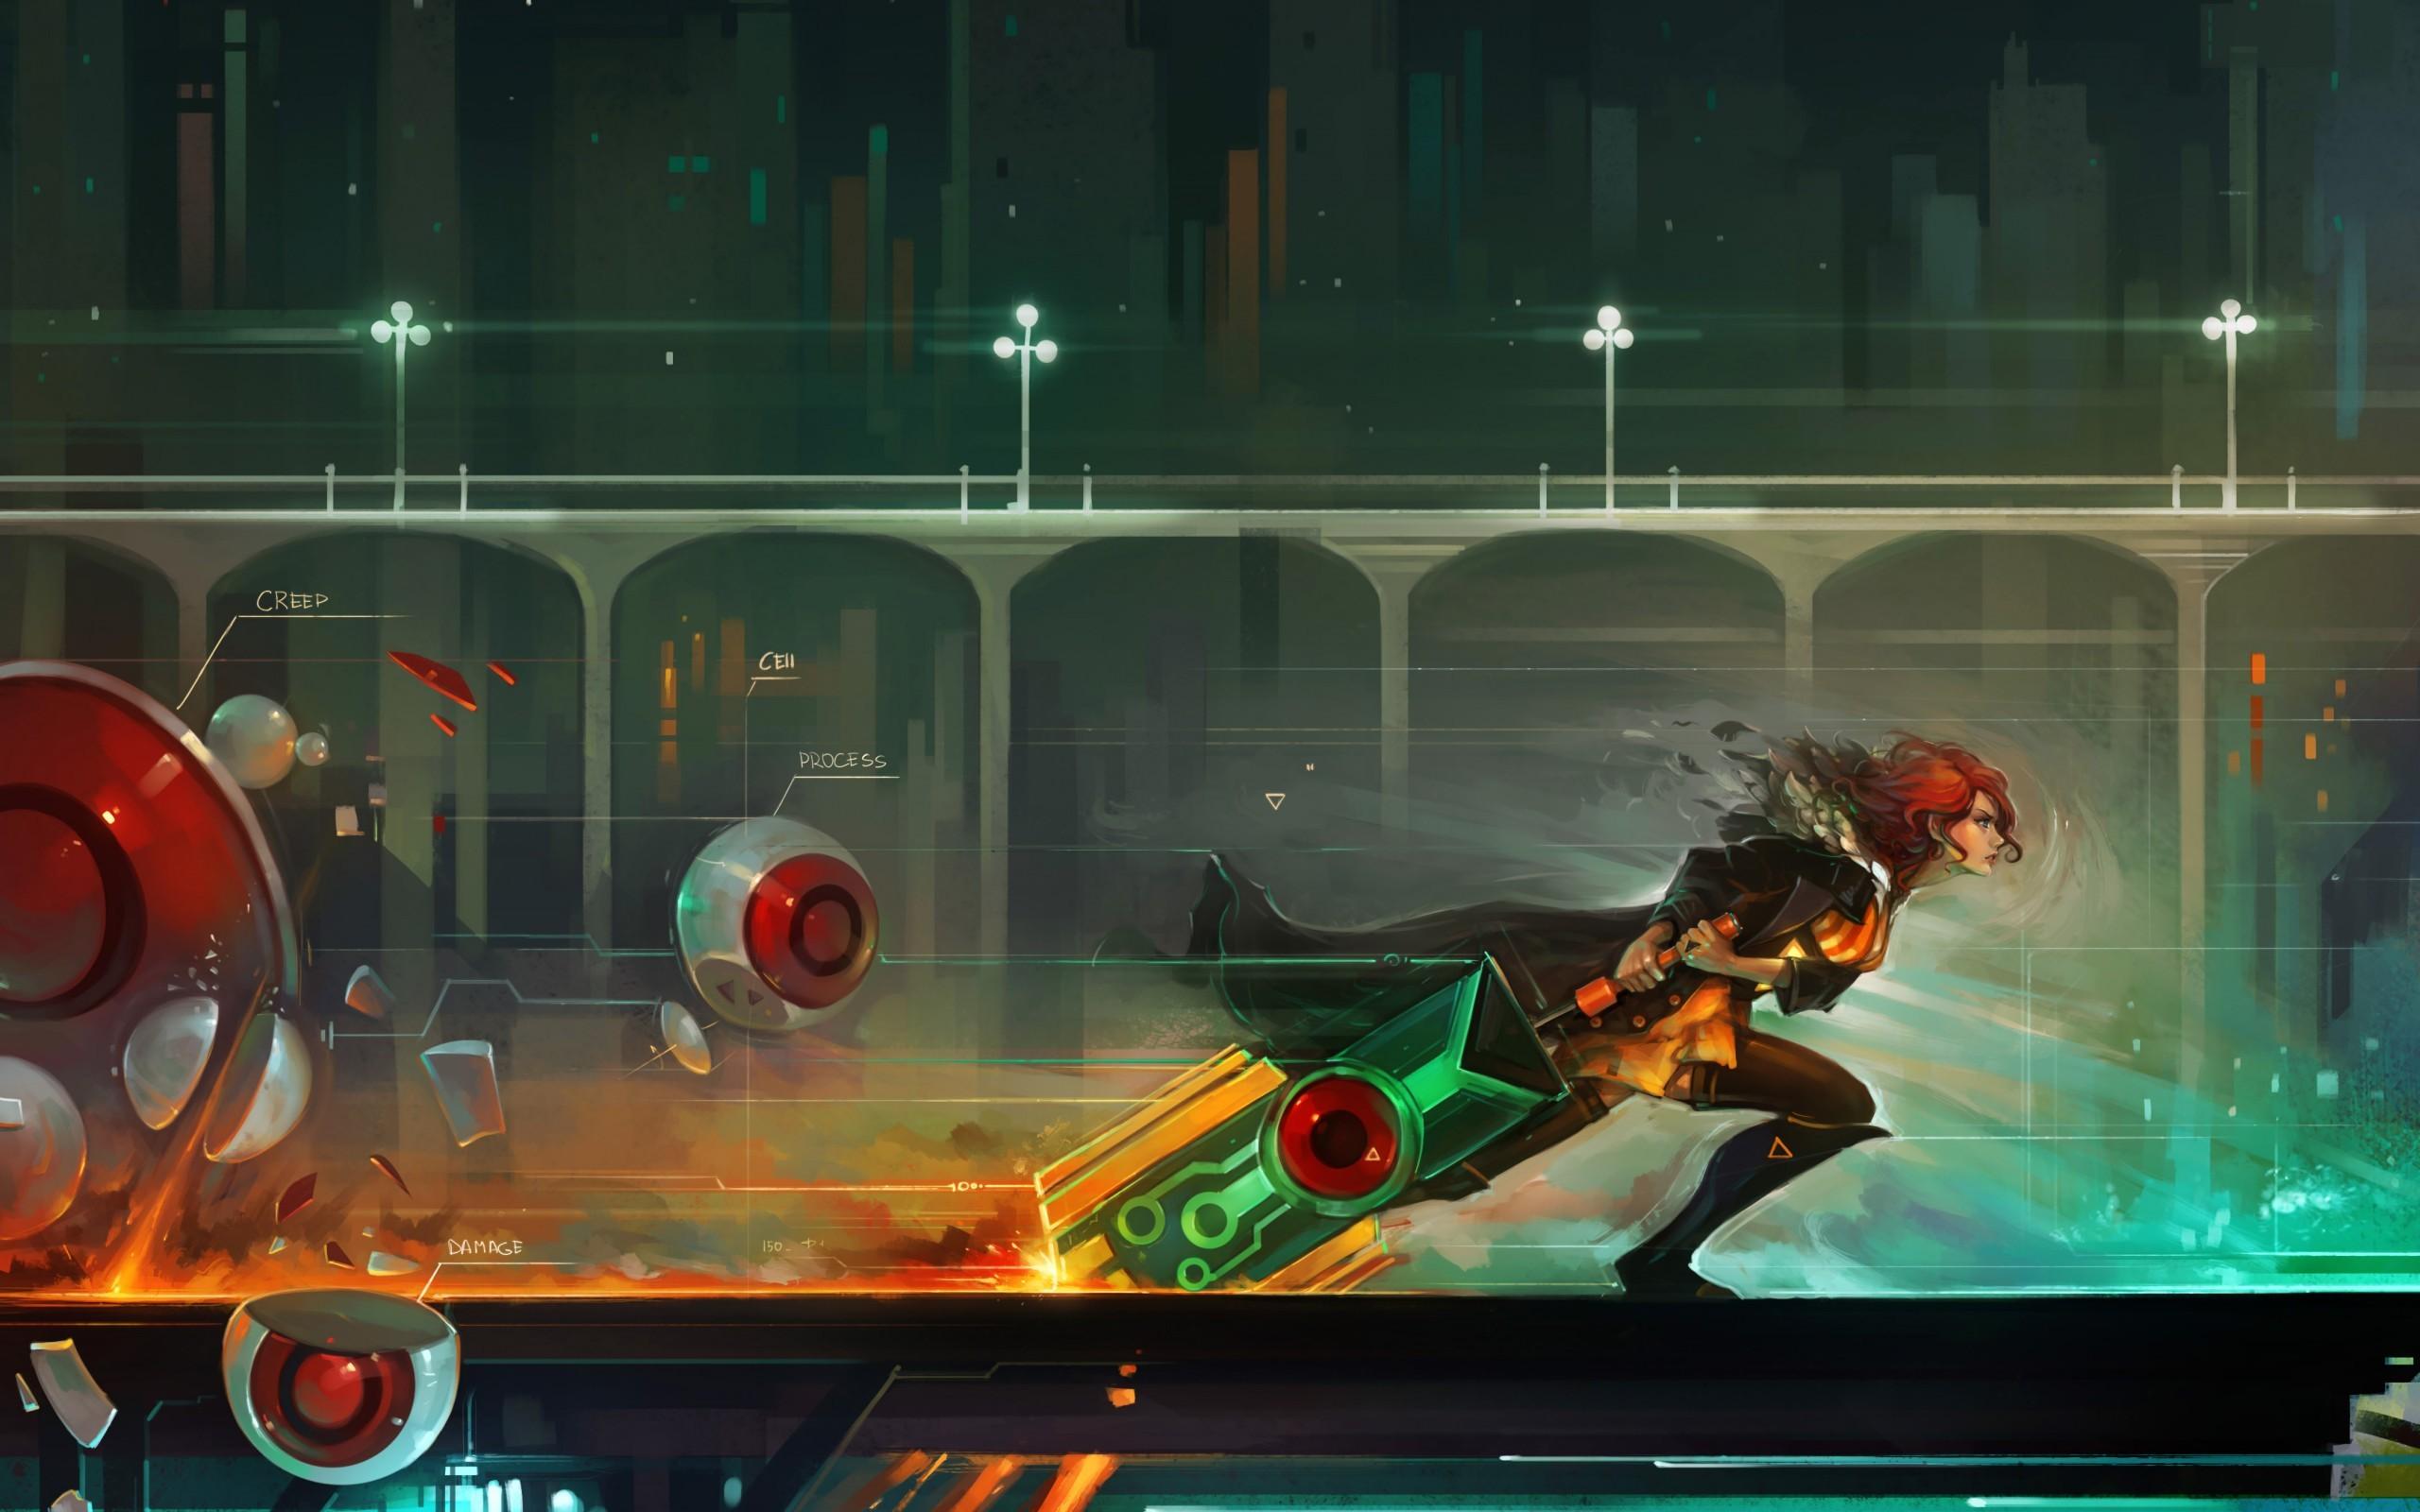 Wallpaper : Red Transistor, Supergiant Games, games